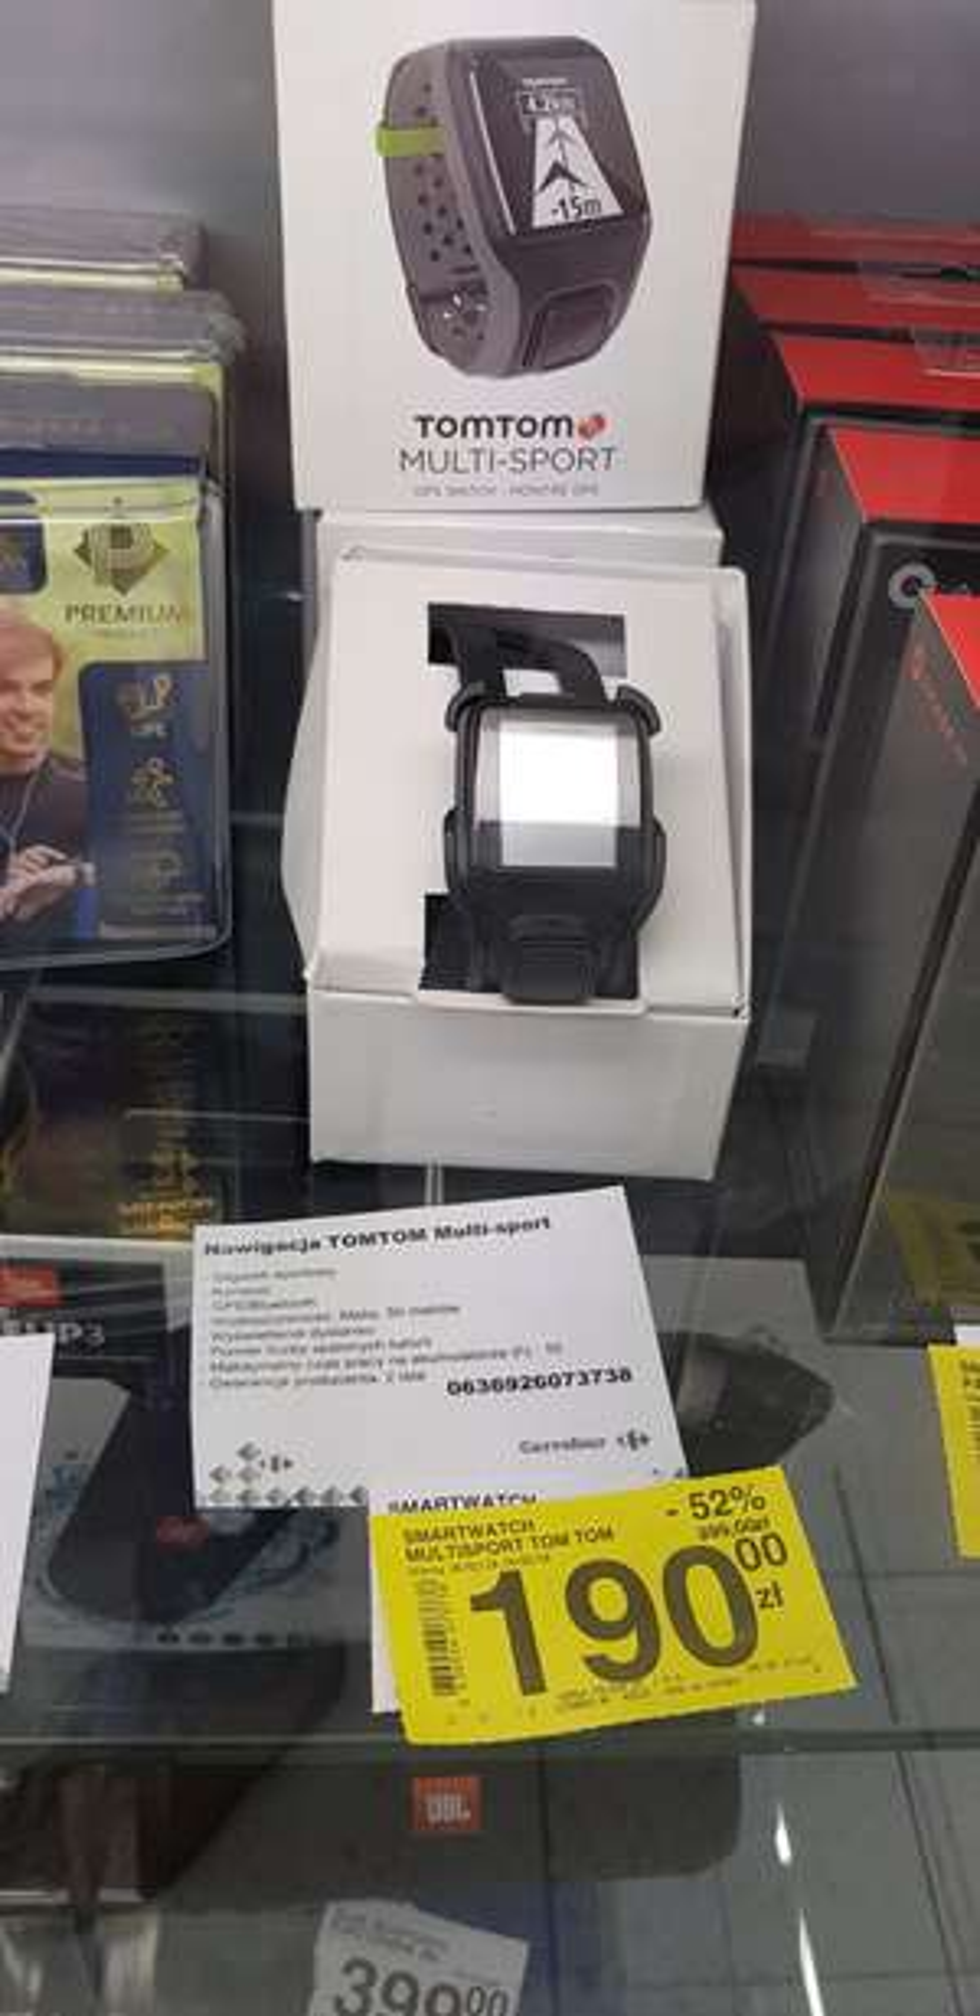 TOMTOM MULTI-SPORT ZEGAREK SPORTOWY GPS